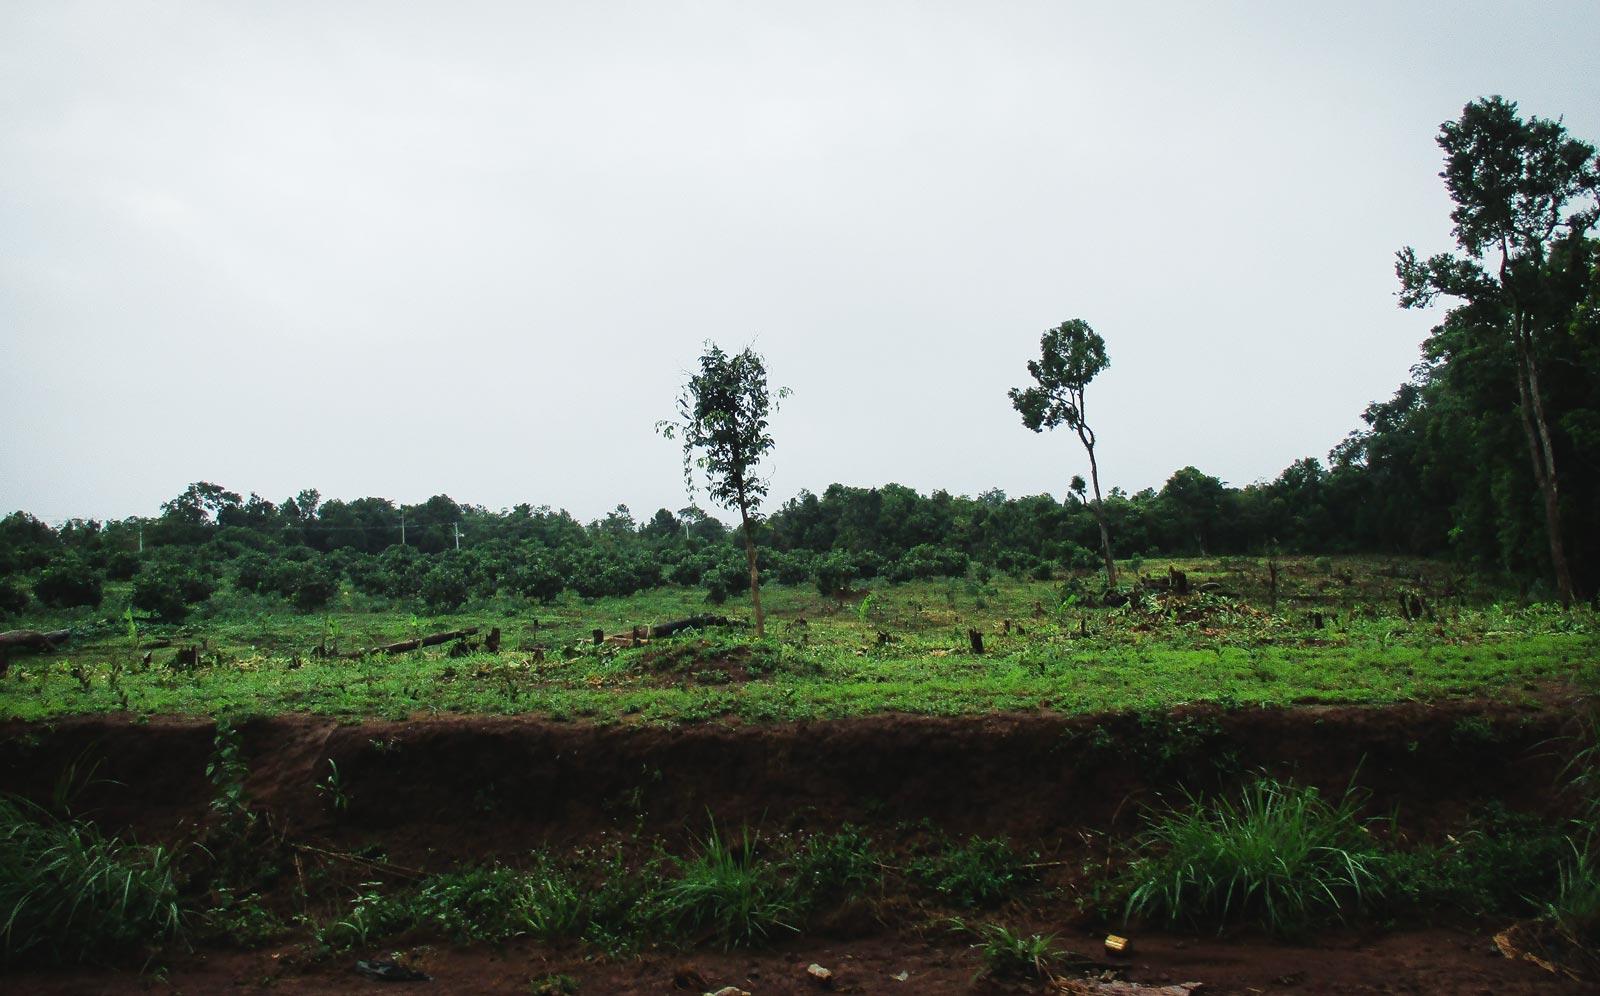 Deforestation near the Bunong village of Andong Kralong. Photo: Tabitha Payne